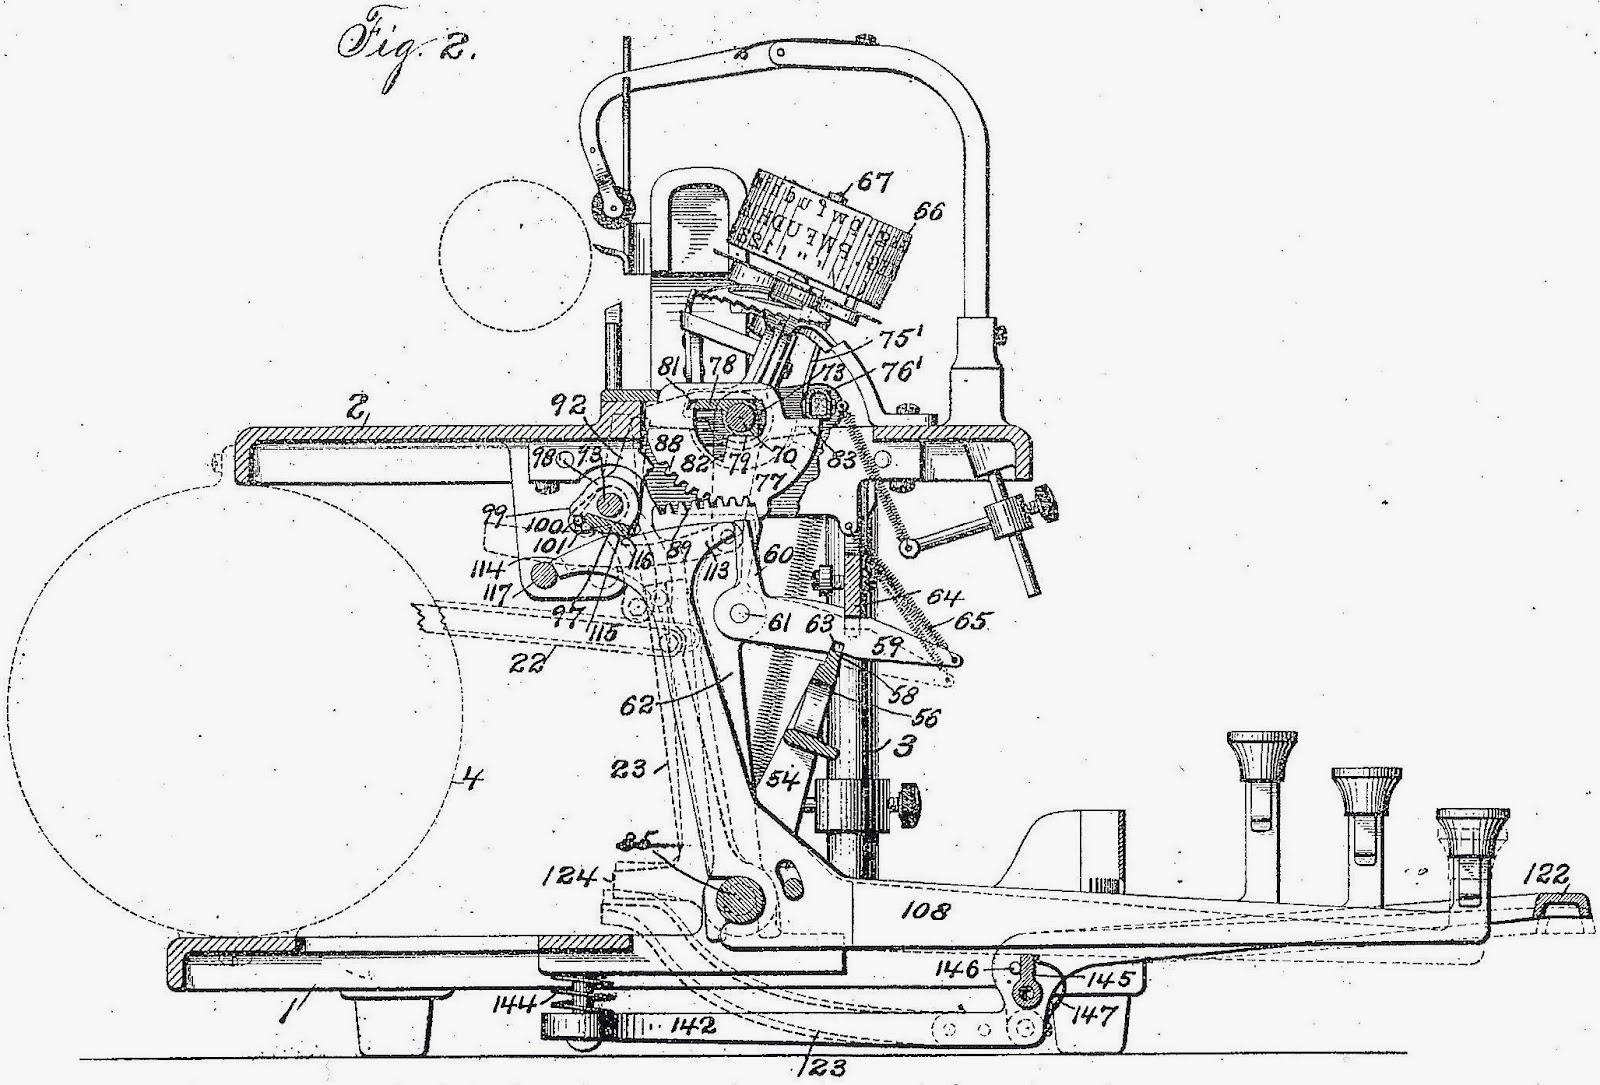 oz.Typewriter: Typewriter Update, February 2014